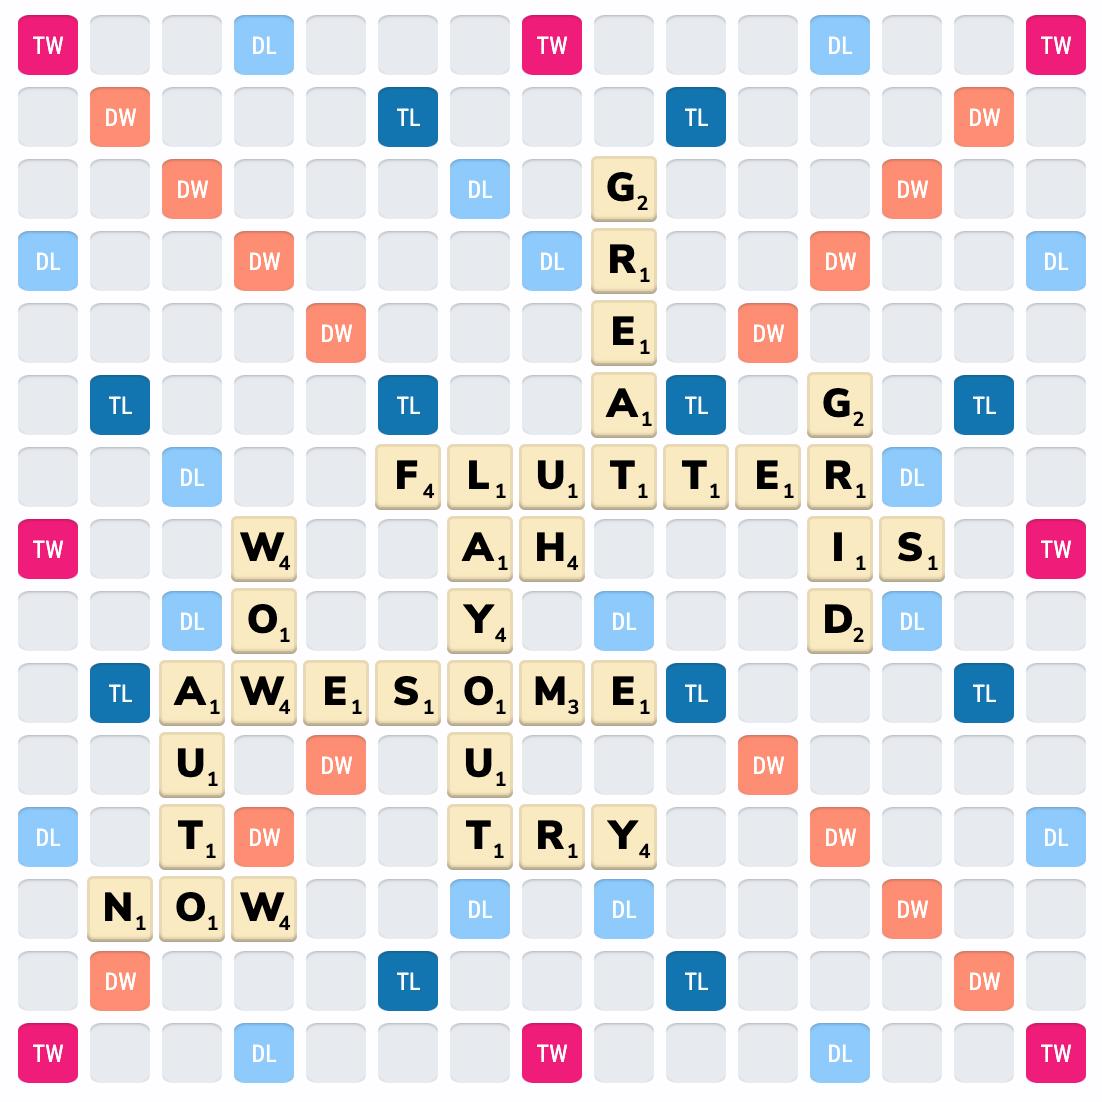 Scrabble board rendered using Flutter Layout Grid